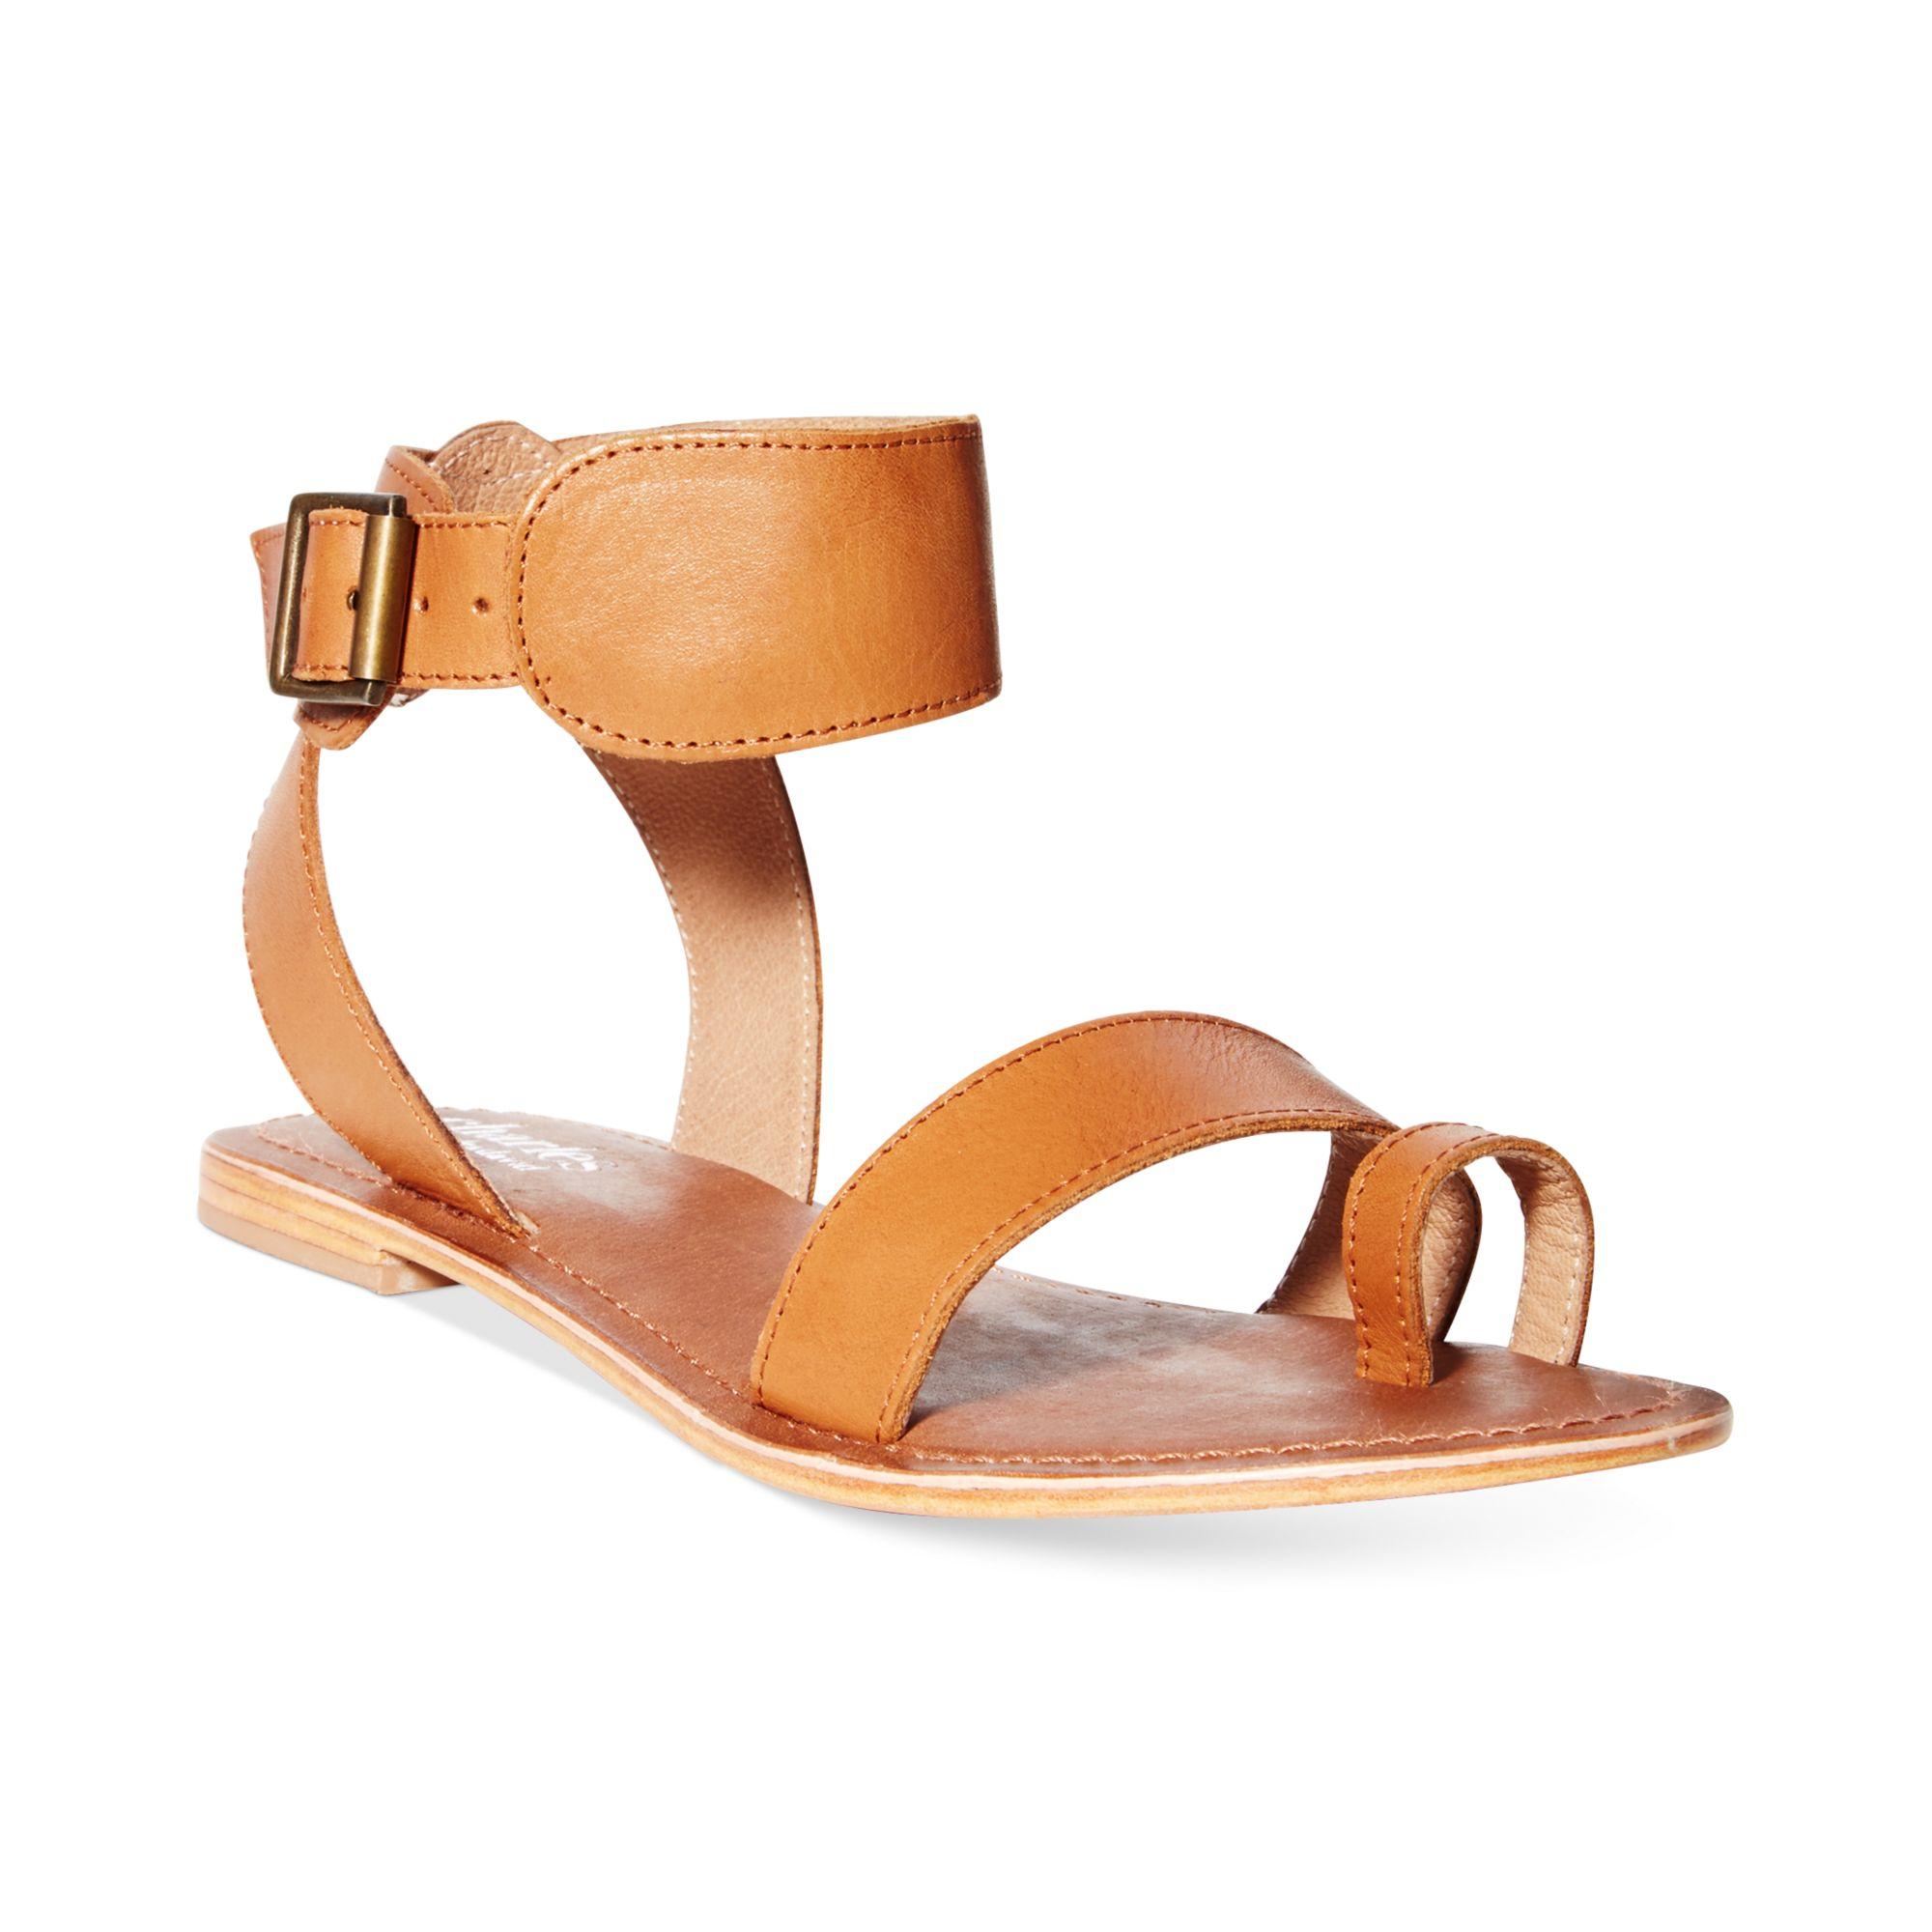 5f427f0670c5 Lyst - Charles David Verge Flat Sandals in Brown